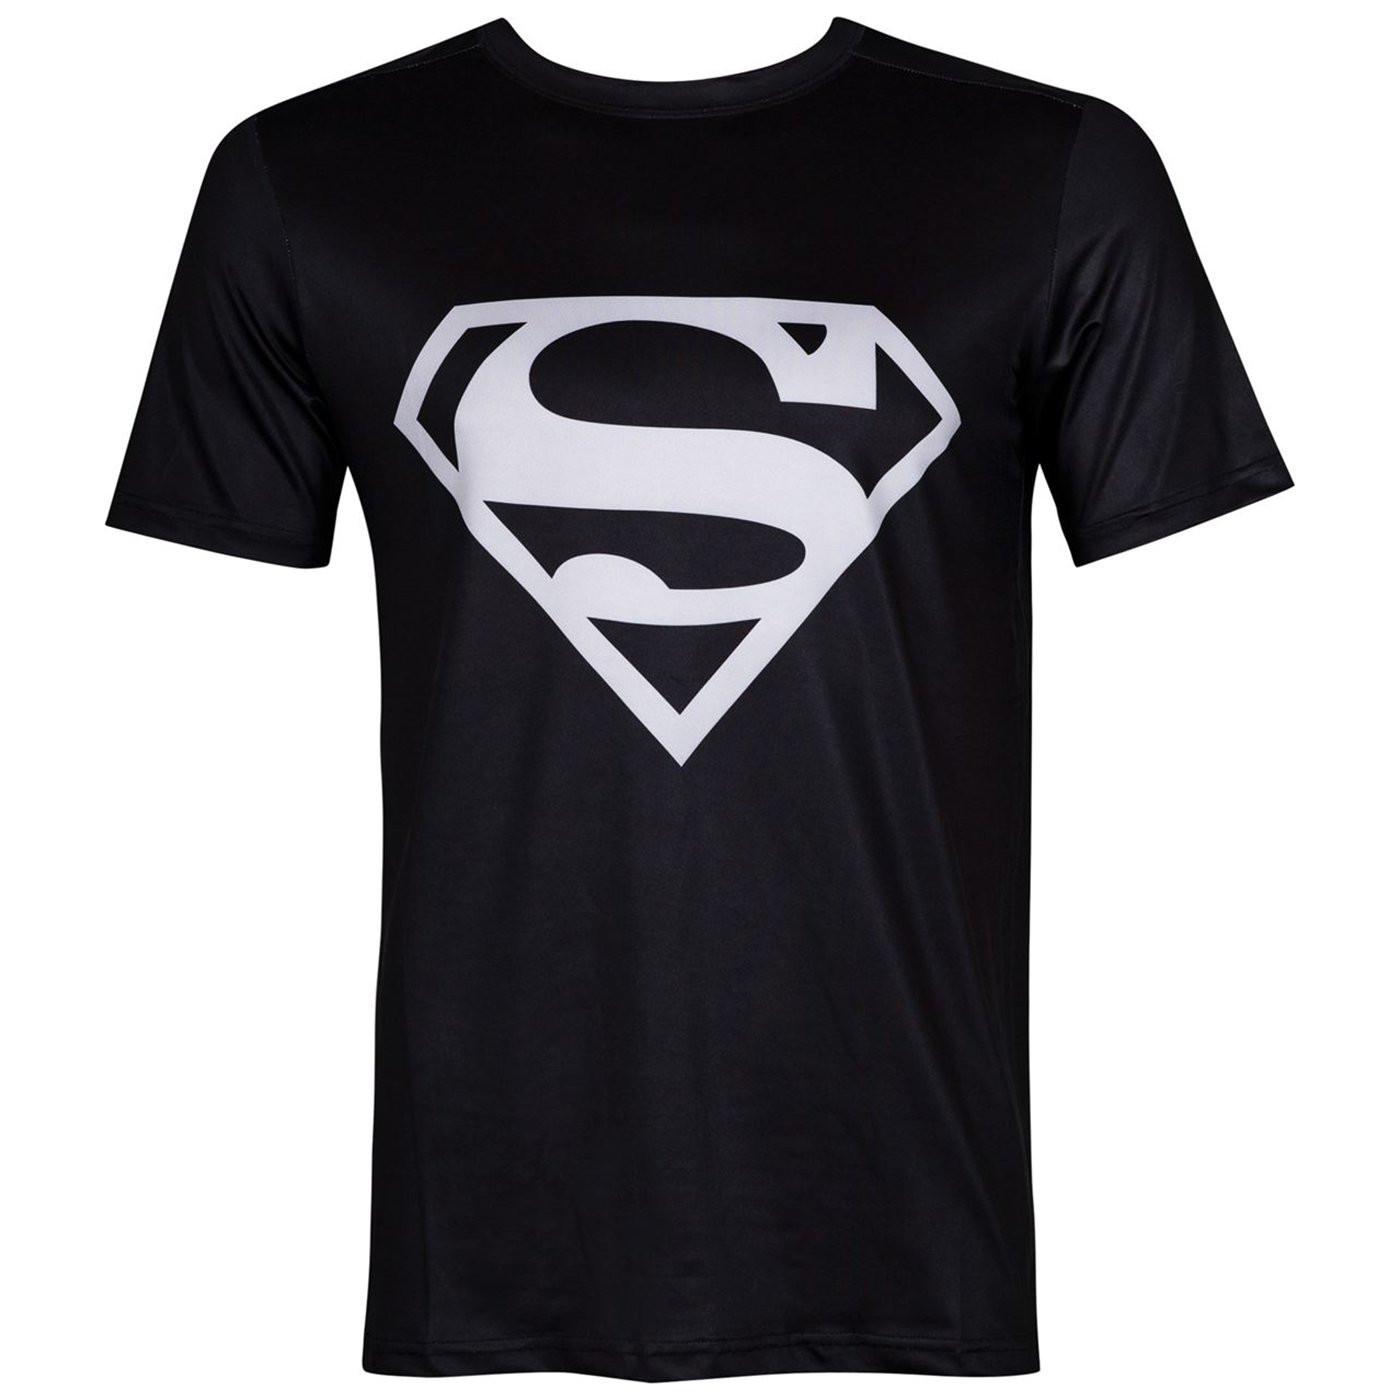 Superman Silver Logo Performance Athletic Adult T-Shirt